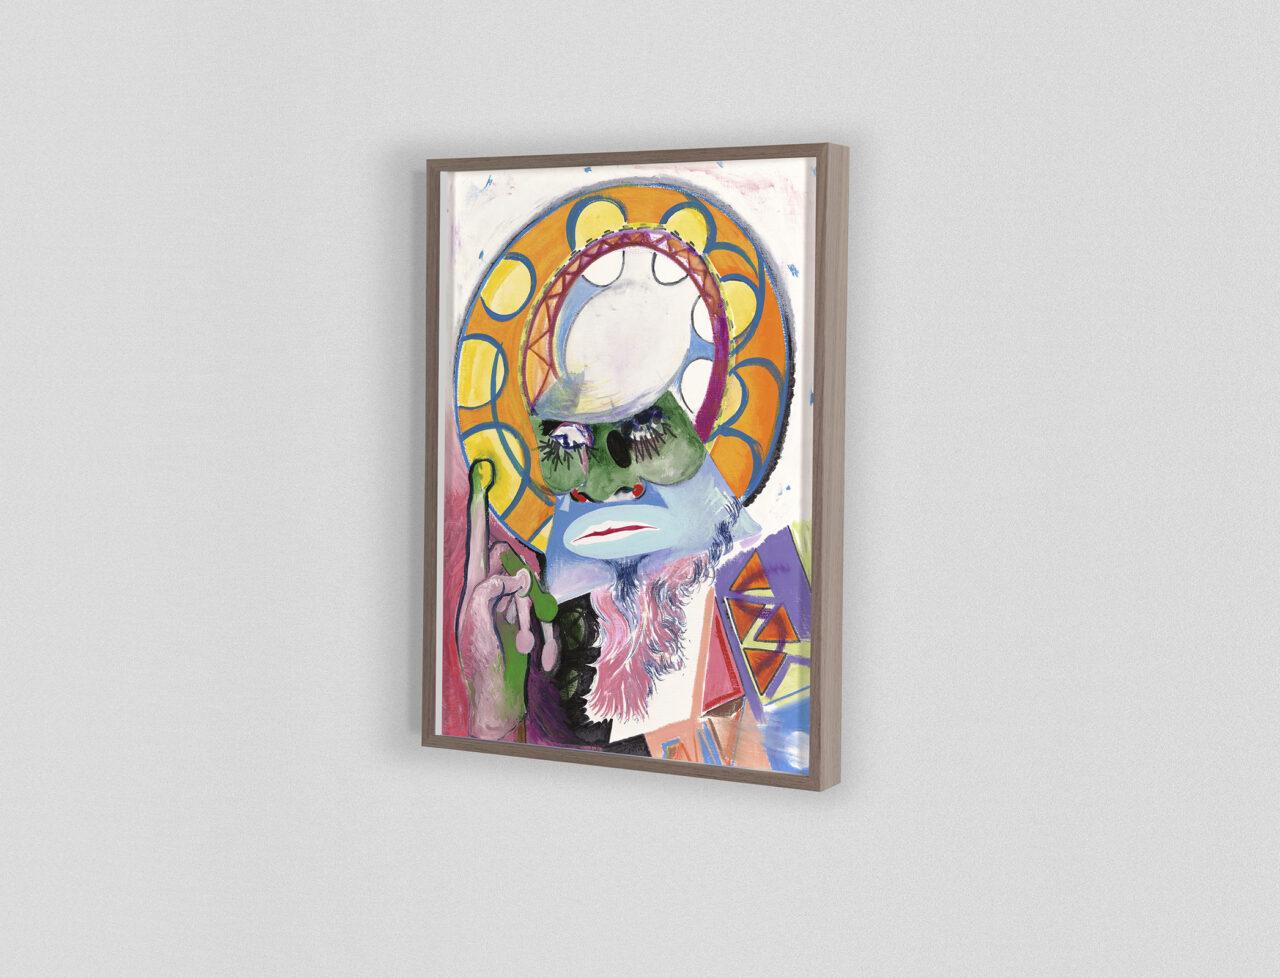 Icon #035 2020 | 40,5 x 29,8 cm. Mixed media on paper